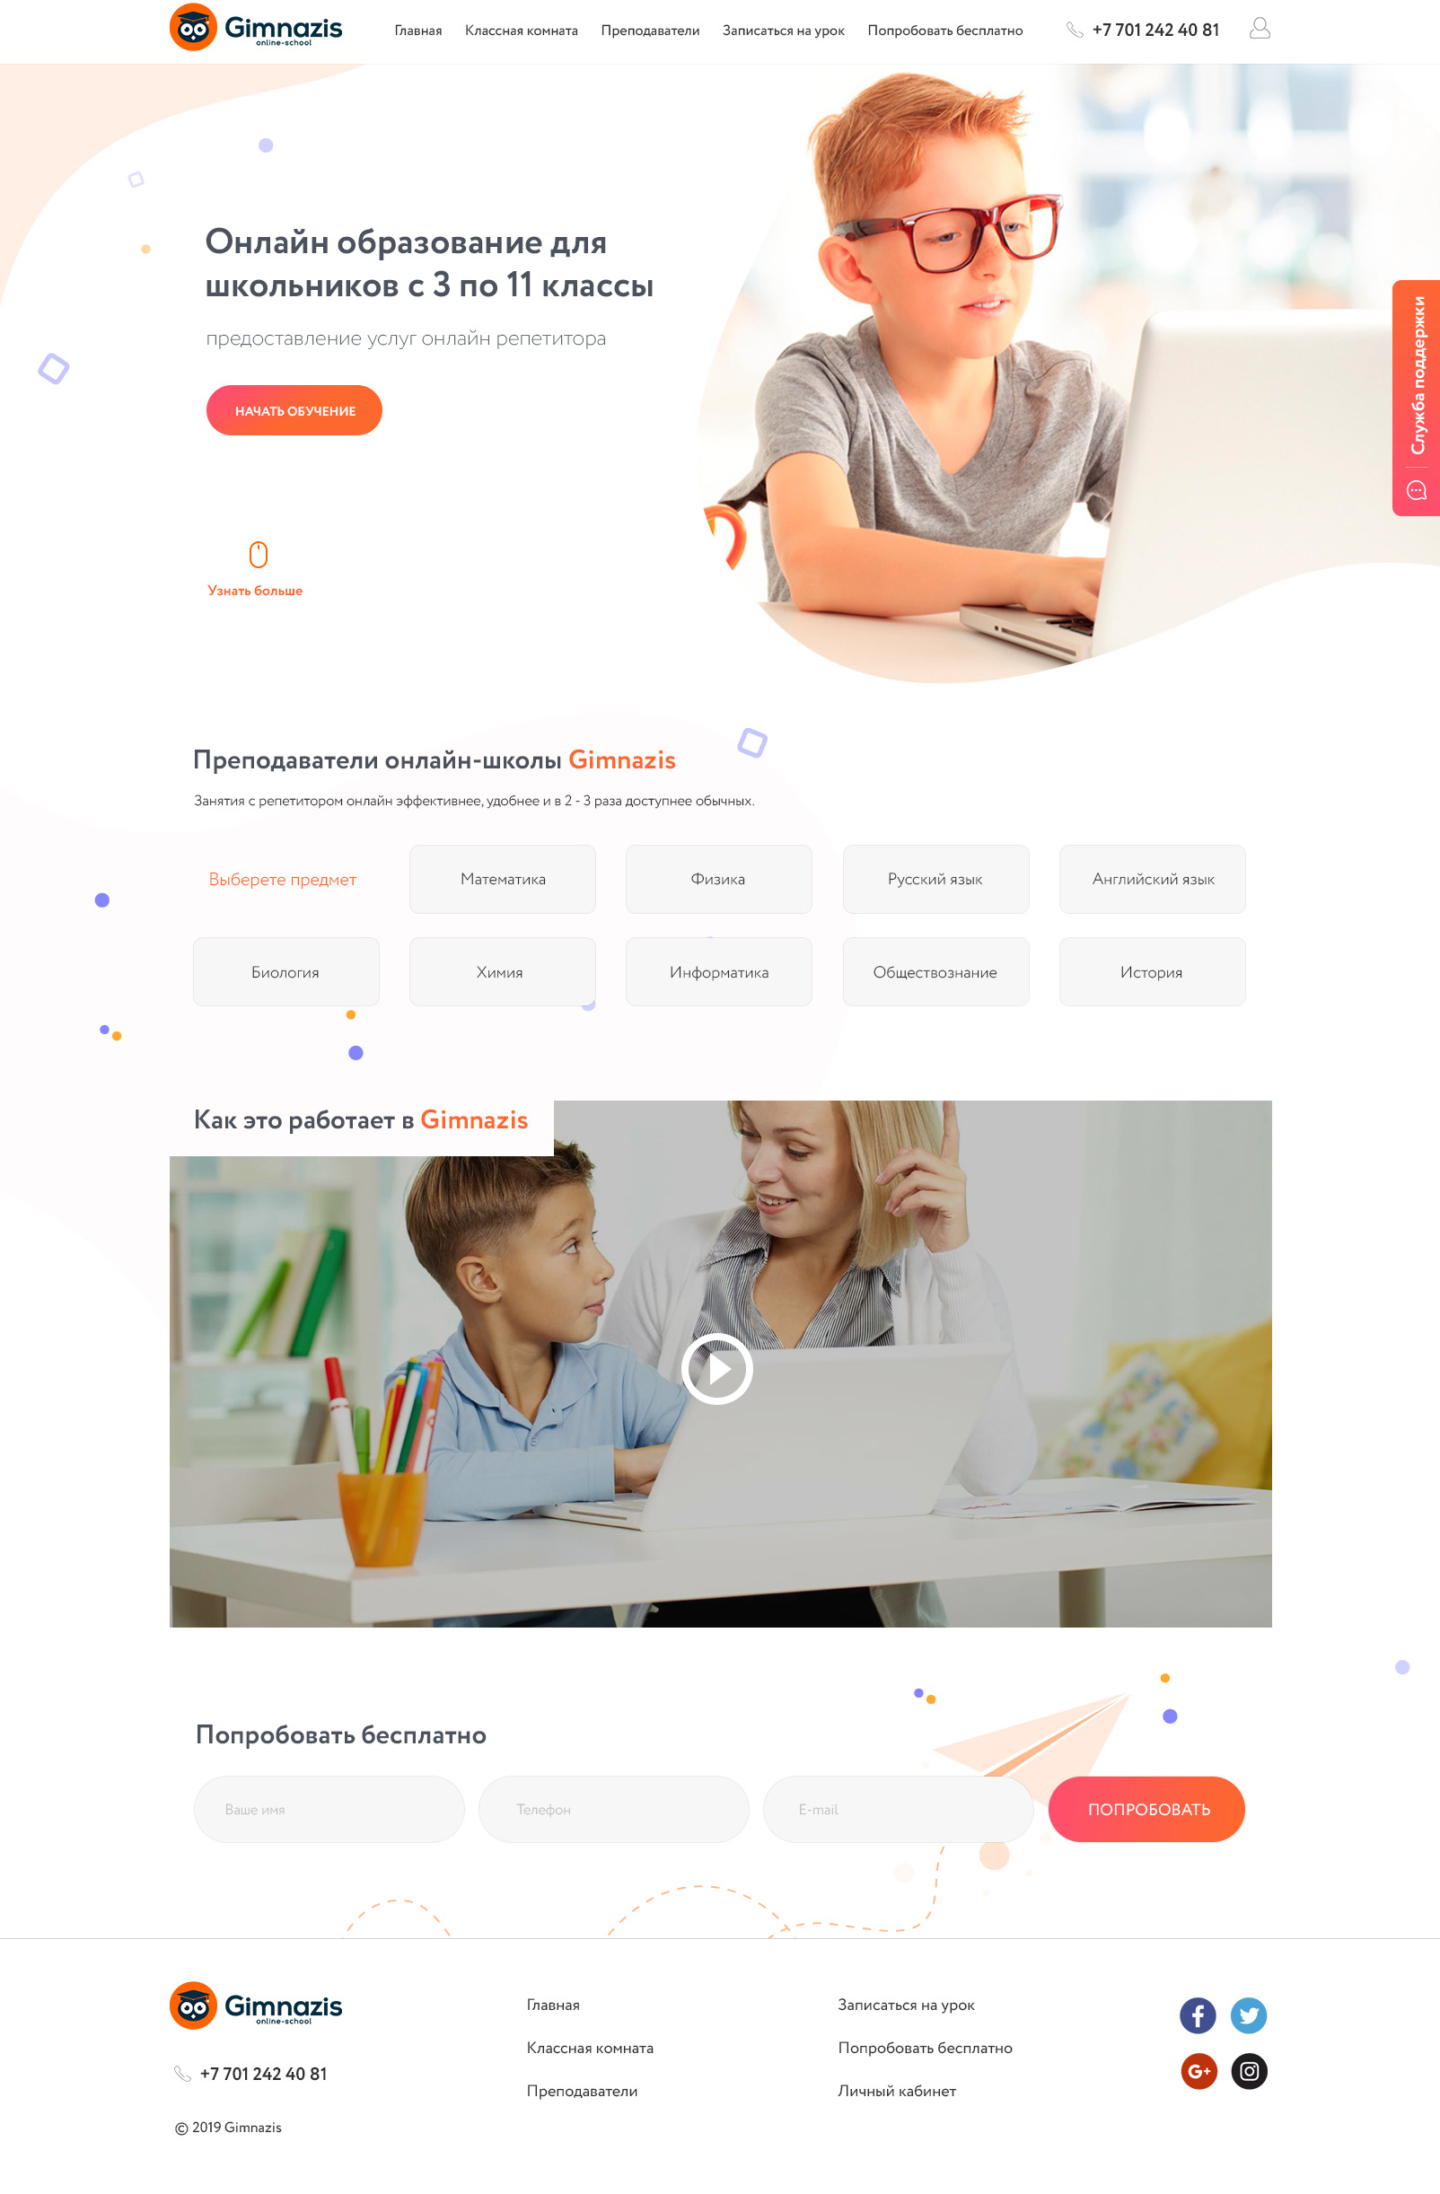 Дизайн сайта - Gimnazis